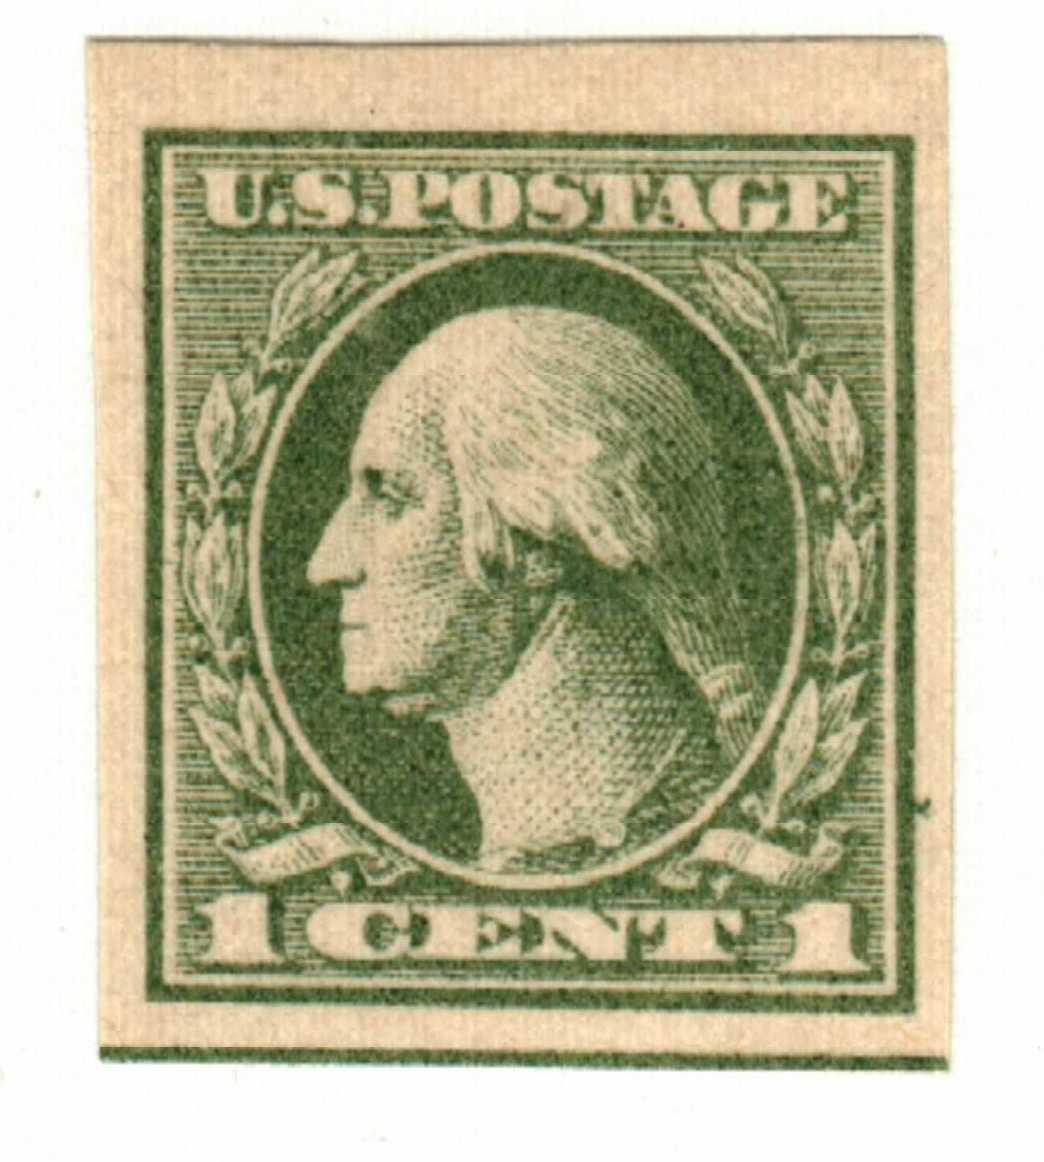 1919 1c Washington, imperforate, gray green